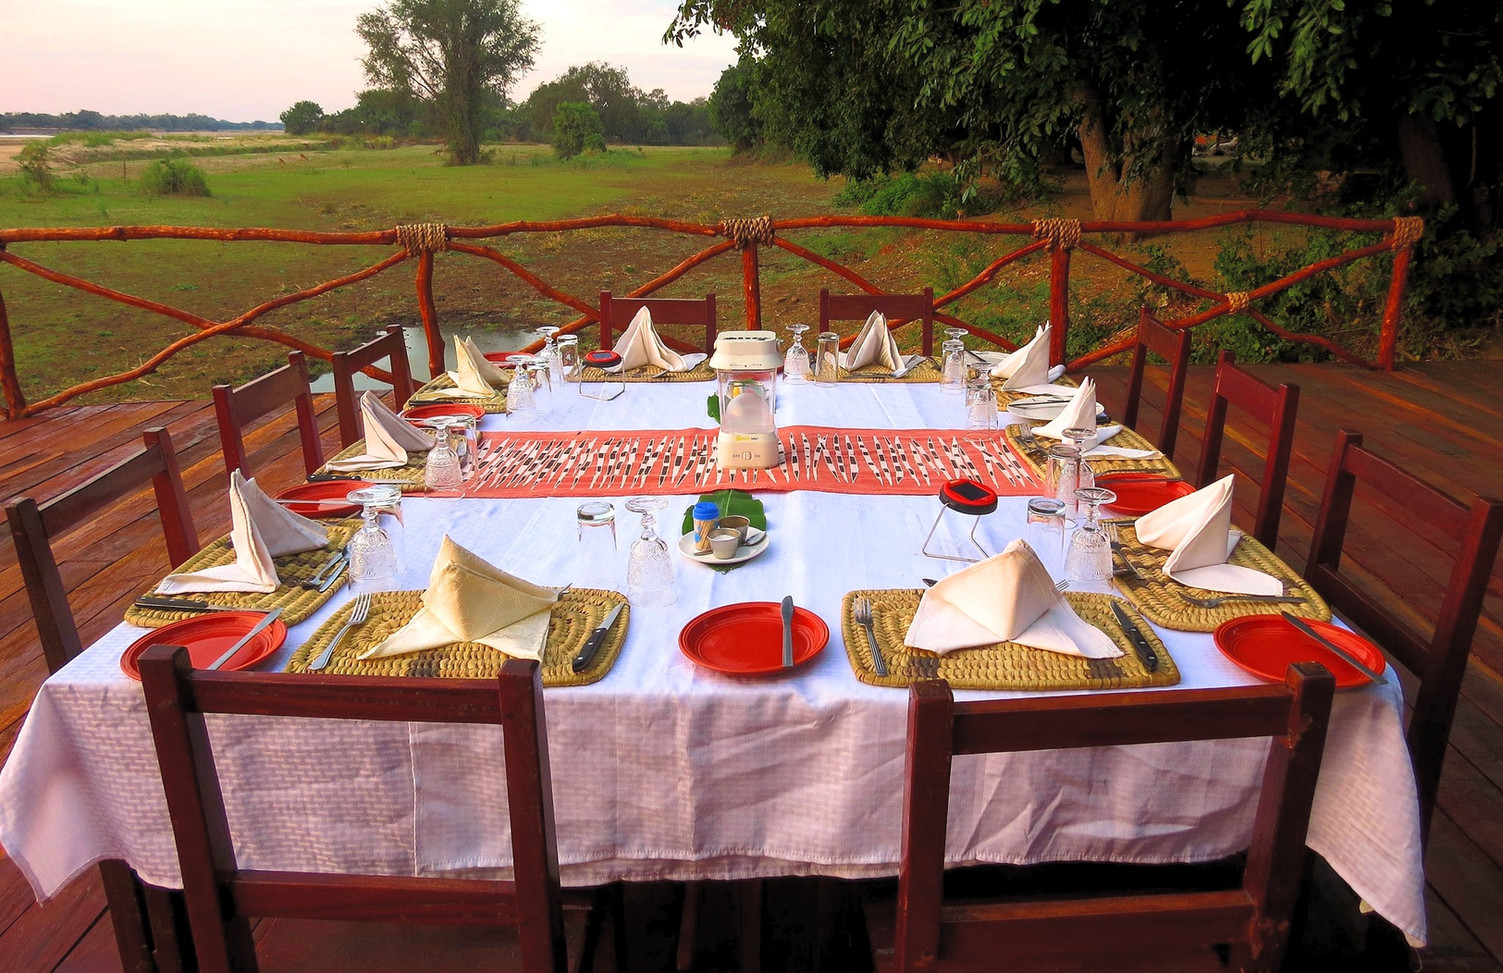 Dinner with a view at Zikomo Safari Lodge